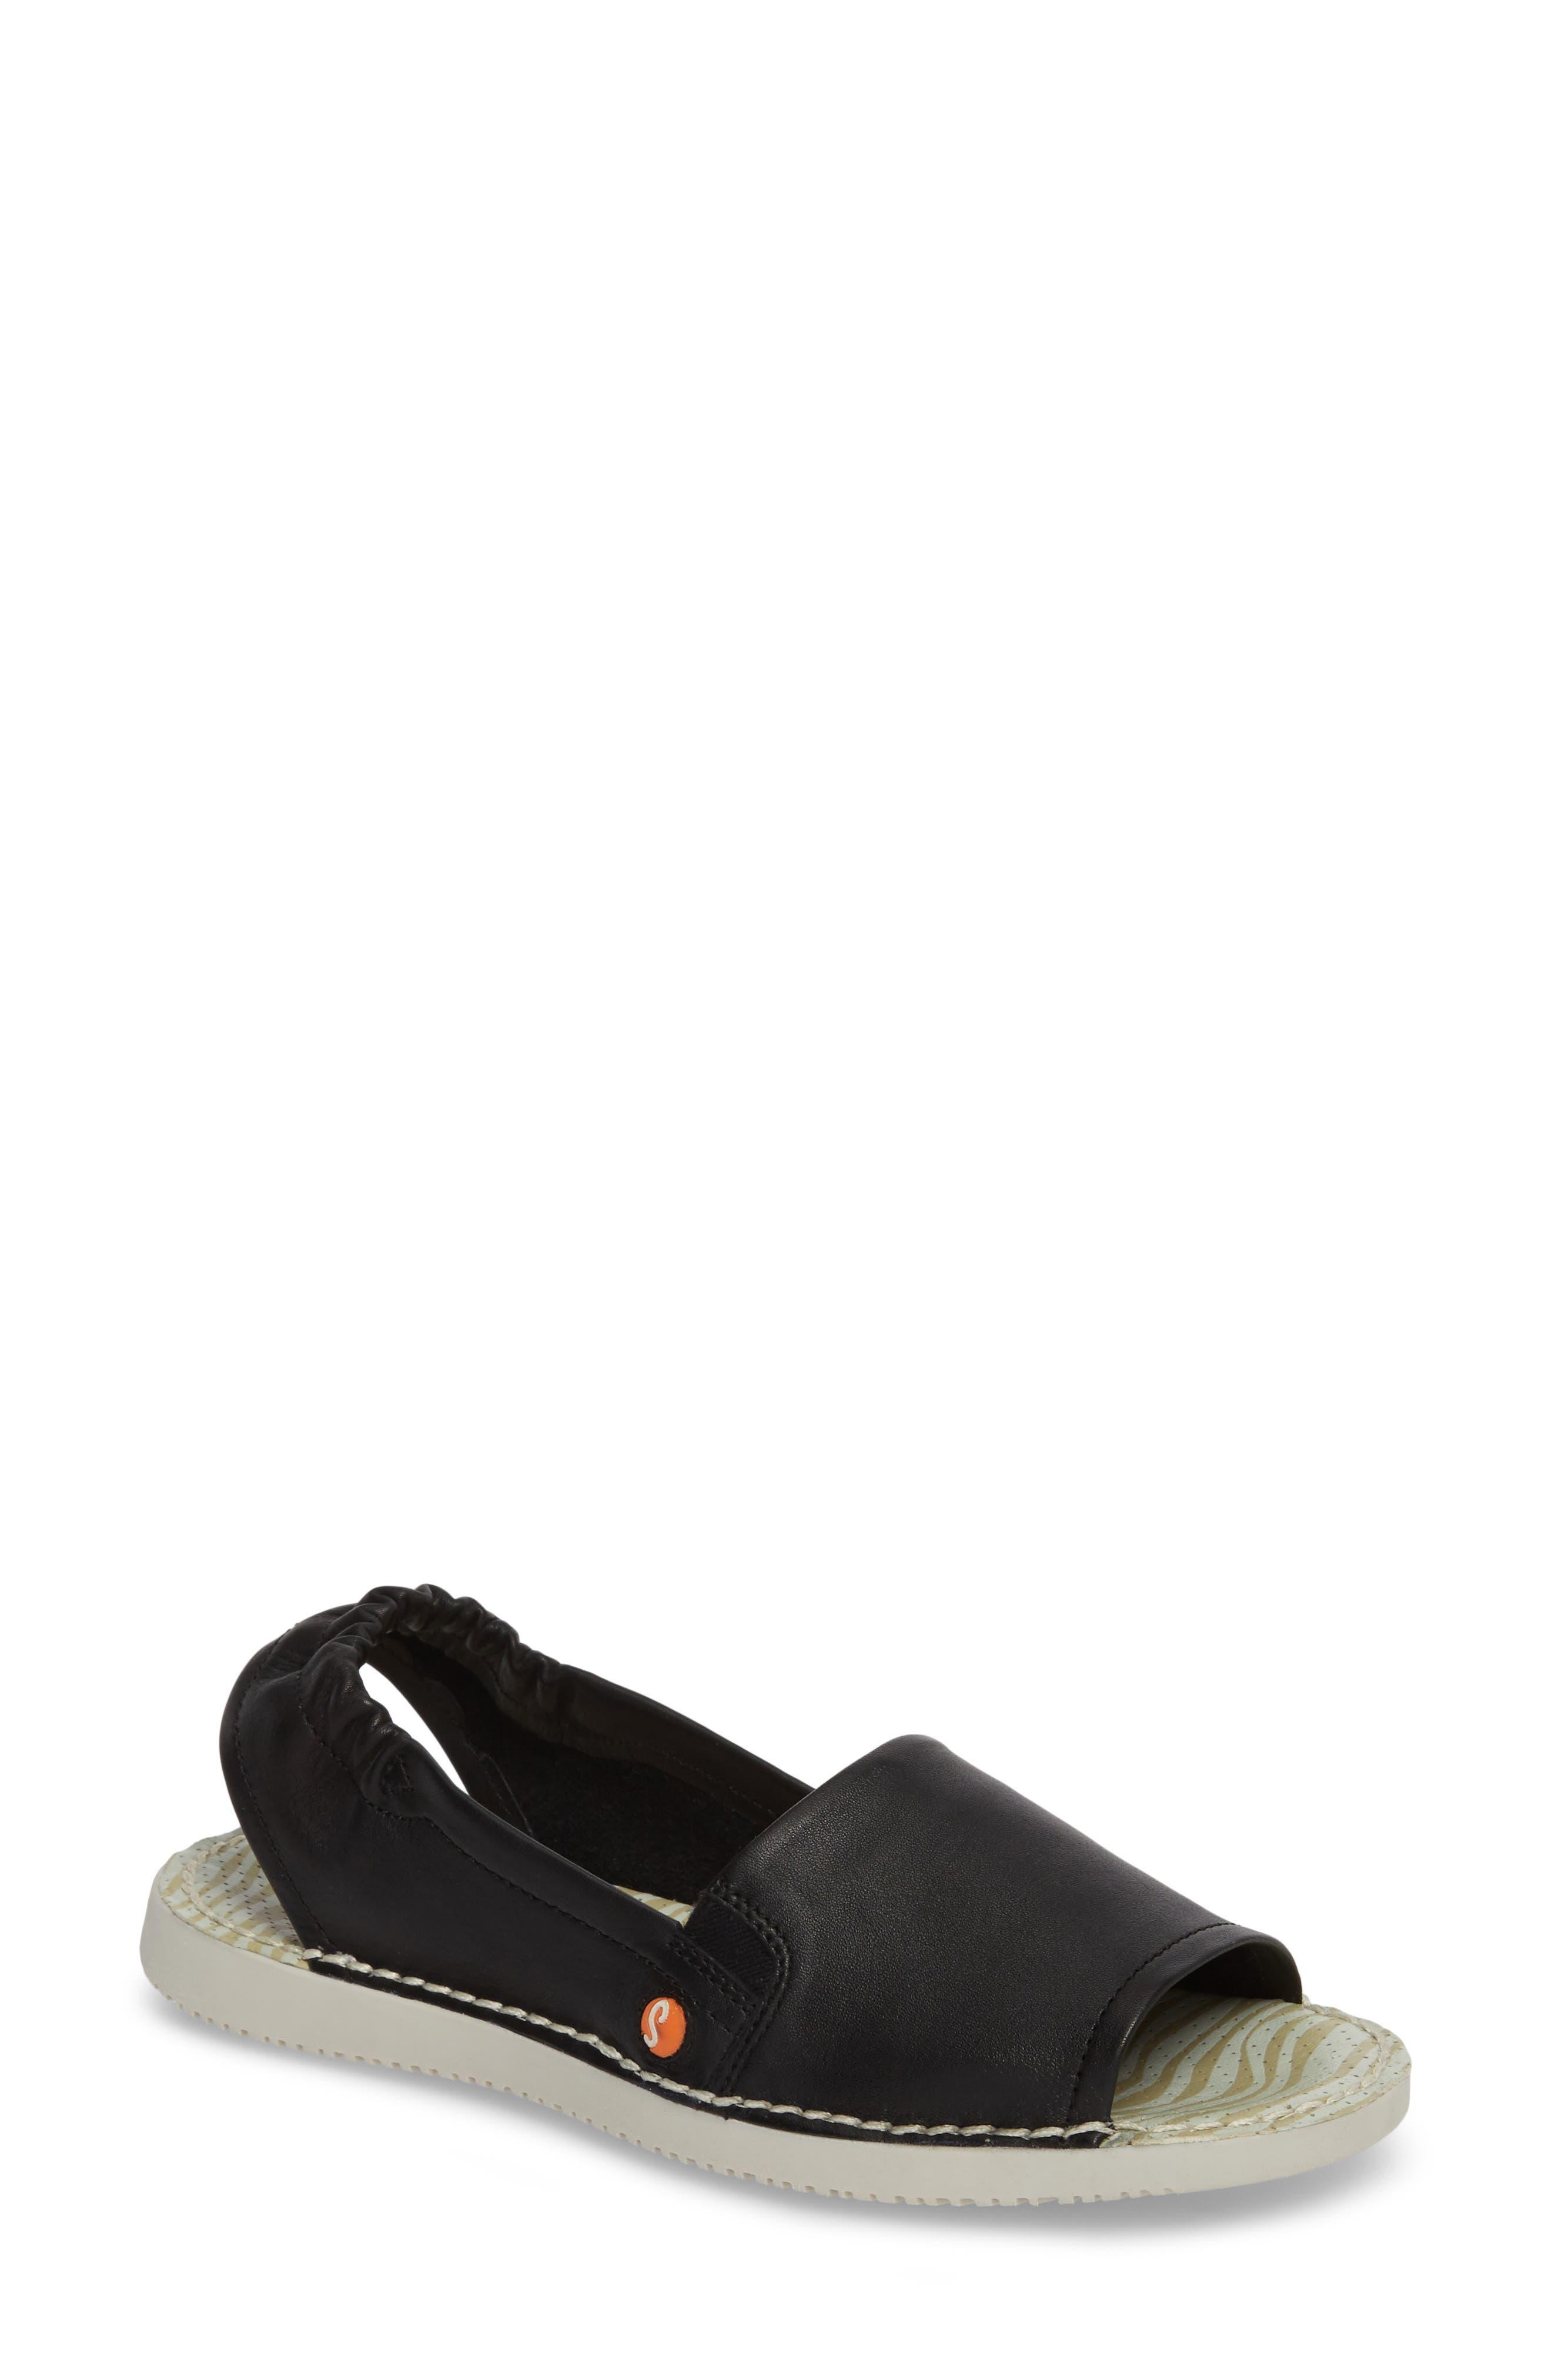 Tee Flat Sandal,                             Main thumbnail 1, color,                             BLACK LEATHER